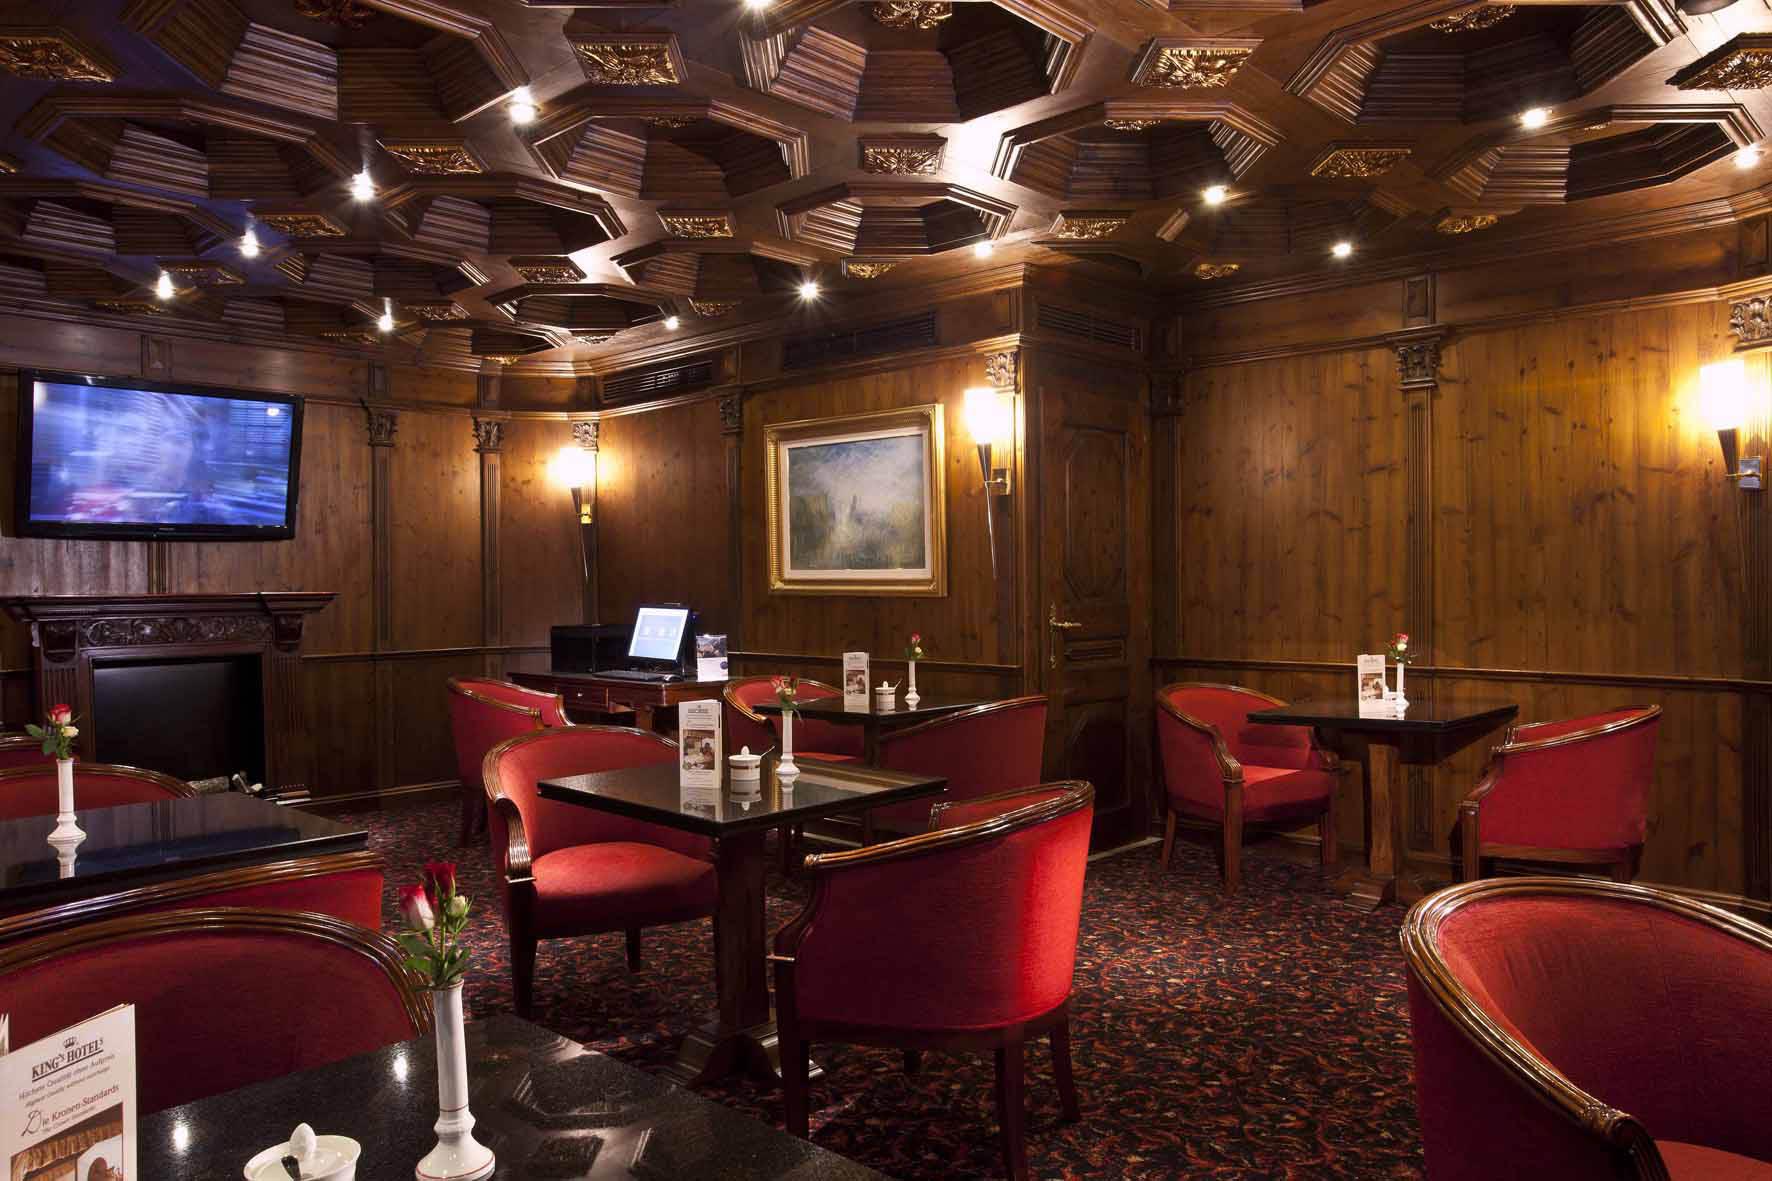 Luxury German Hotels Strike Distribution Partnership With